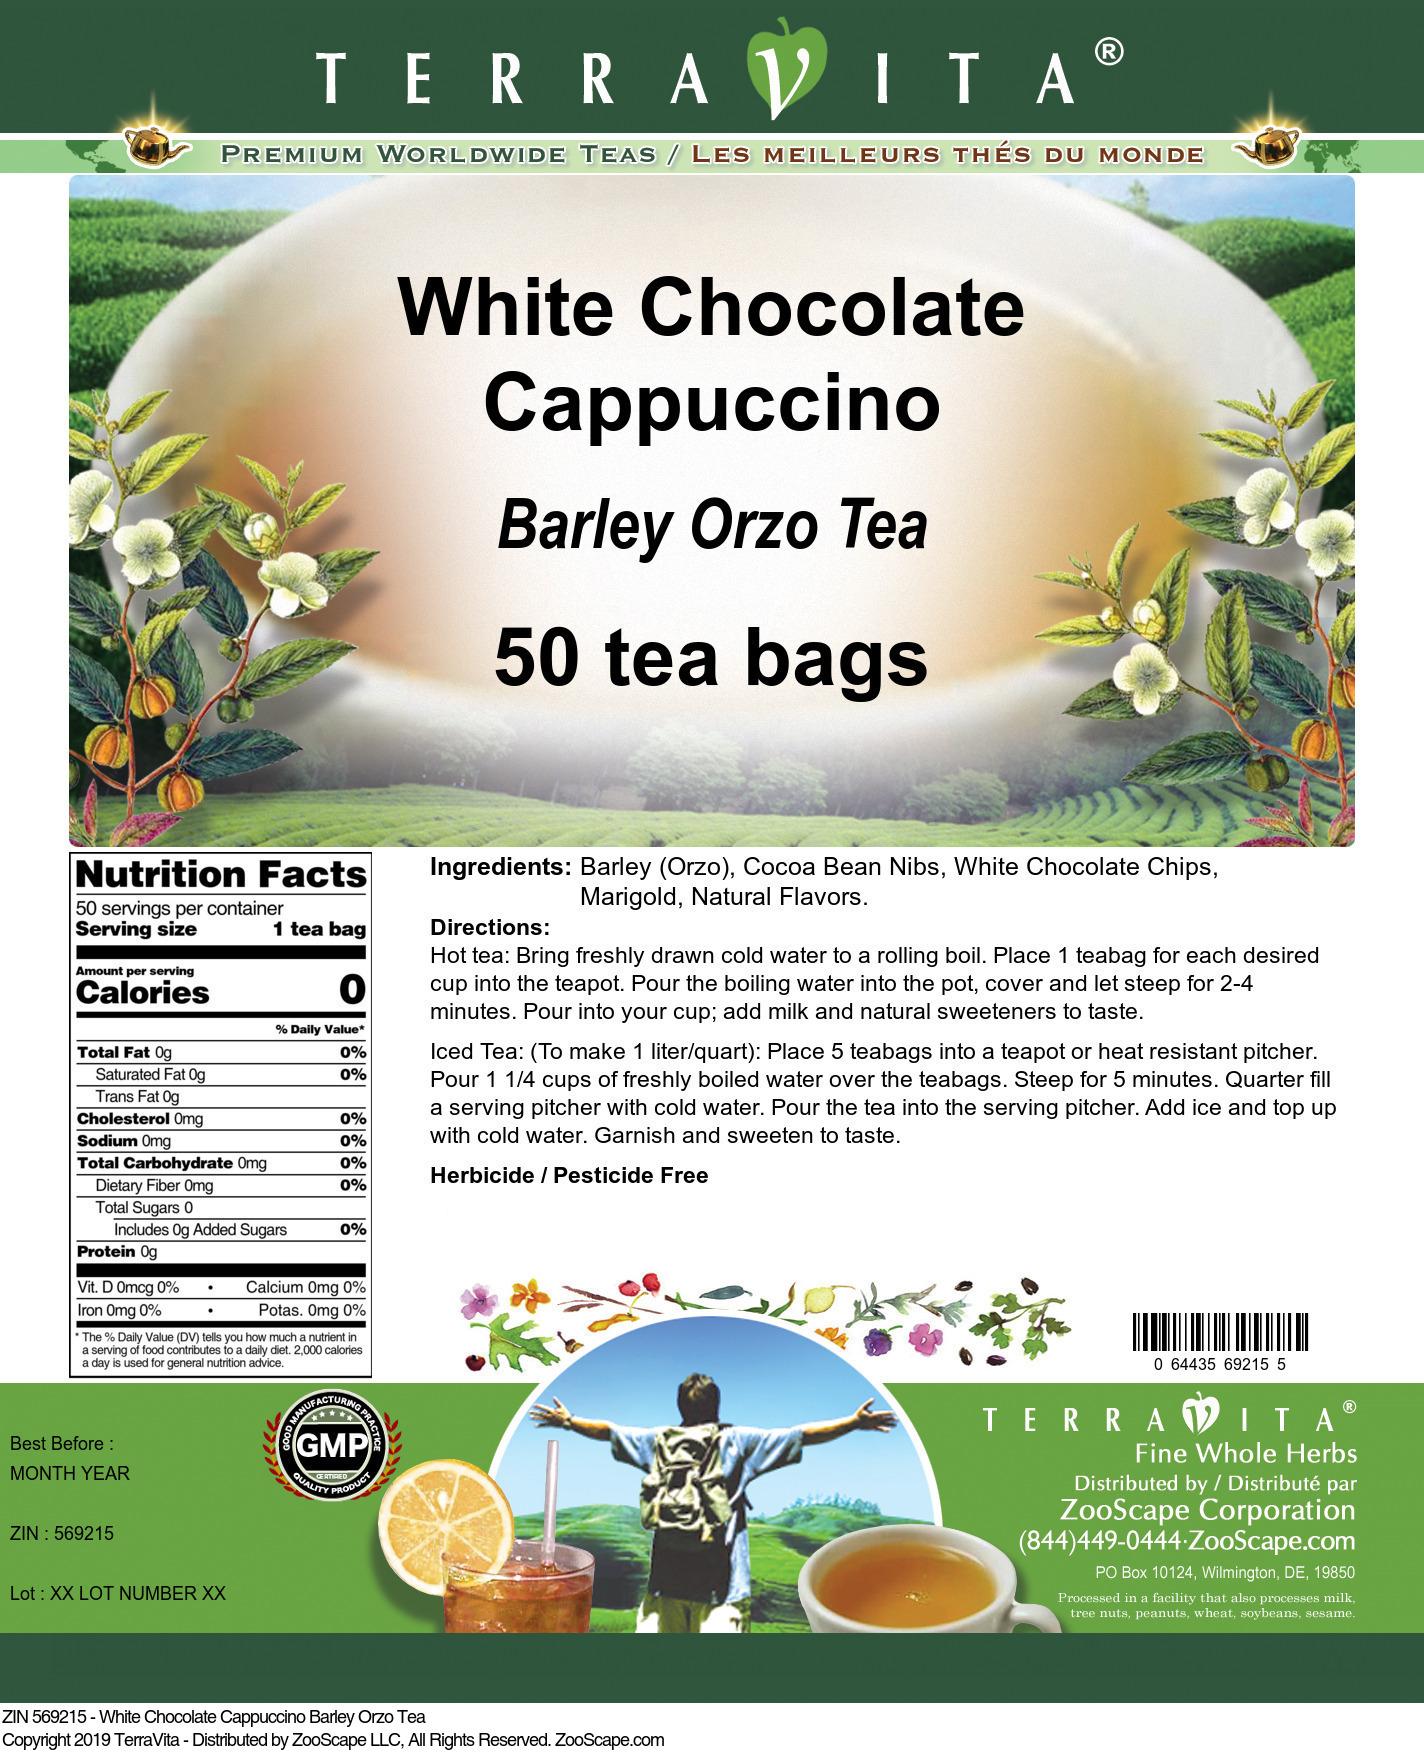 White Chocolate Cappuccino Barley Orzo Tea